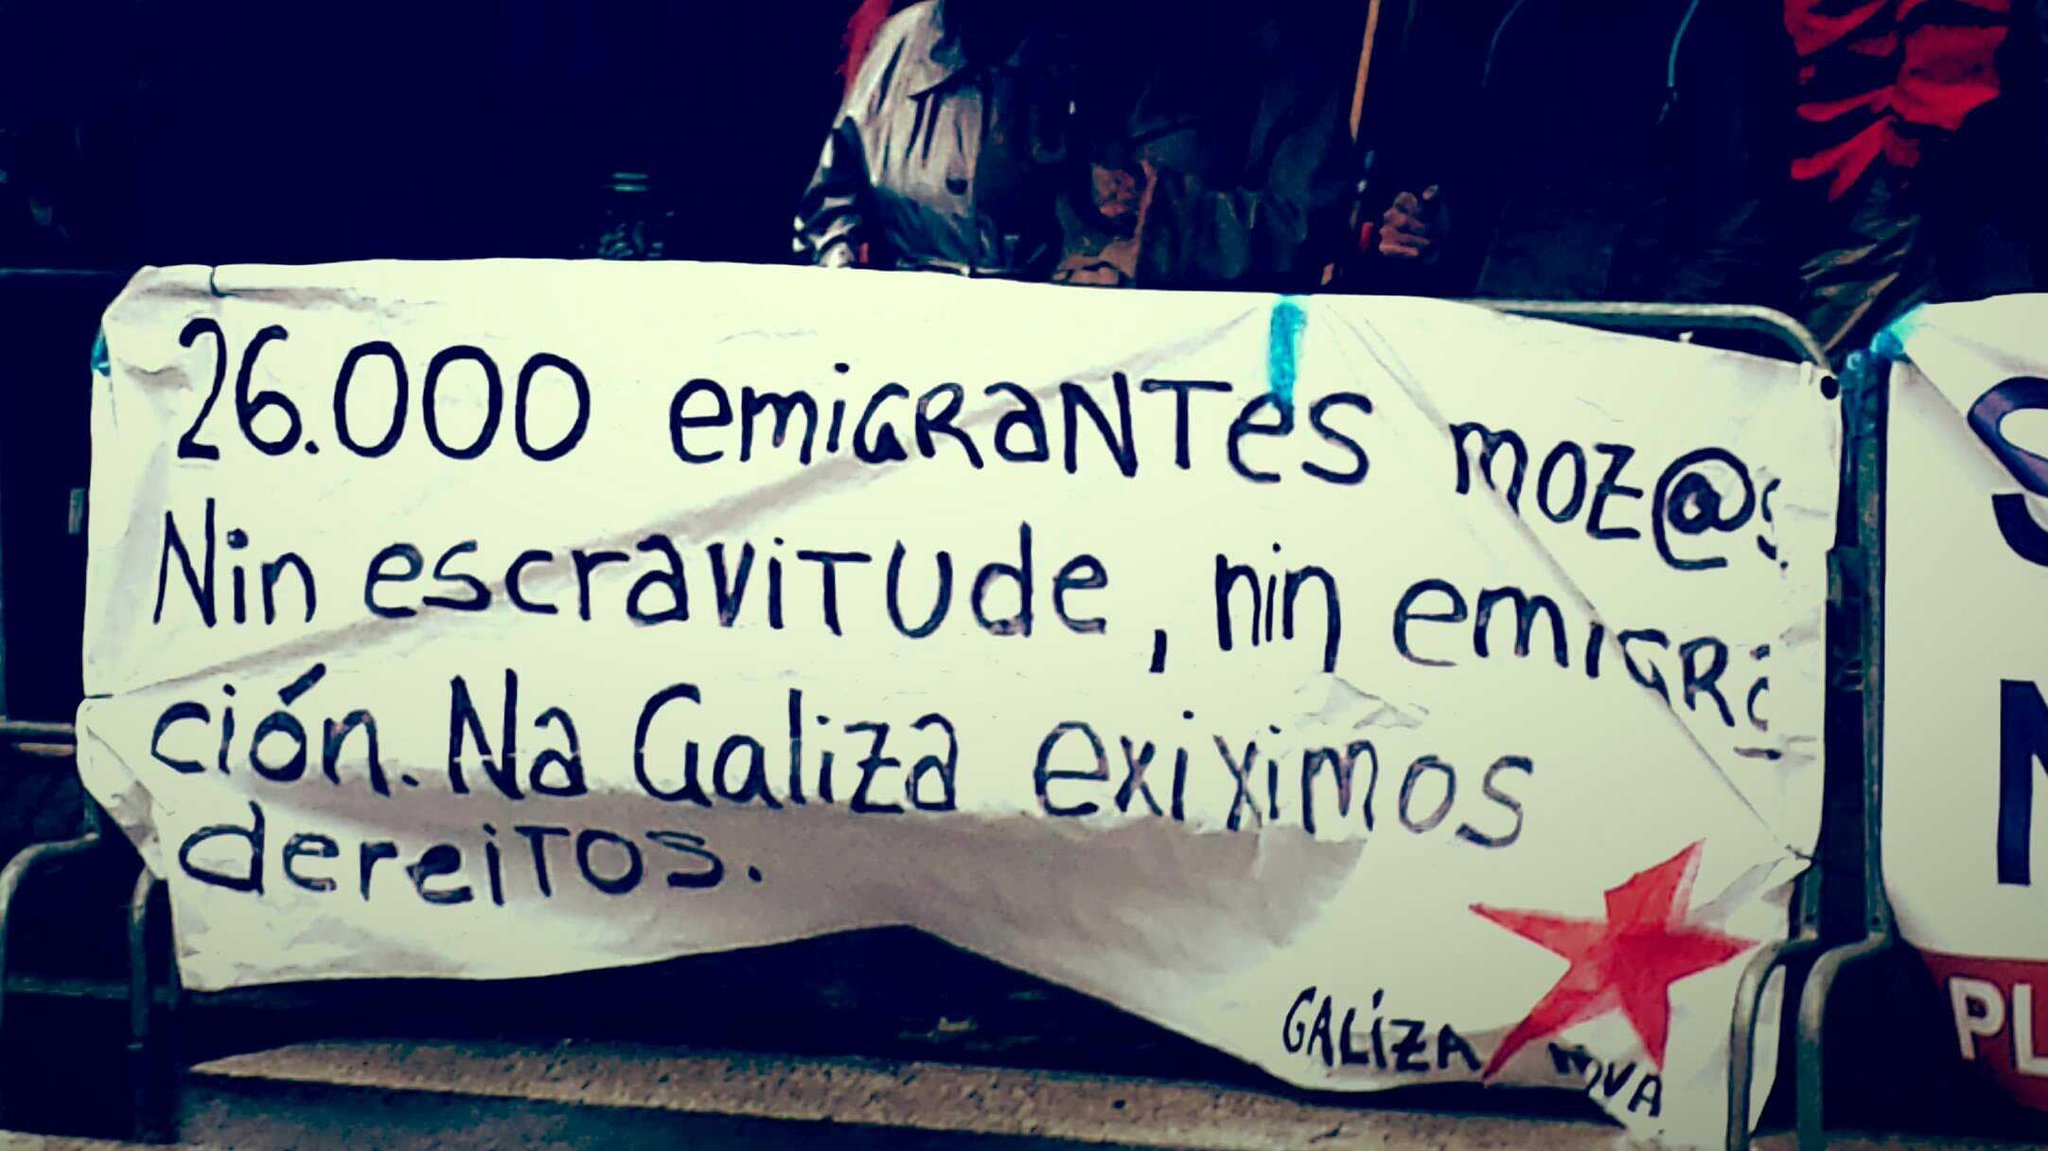 Twitter / galizanova: Protestando diante do Parlamento! ...